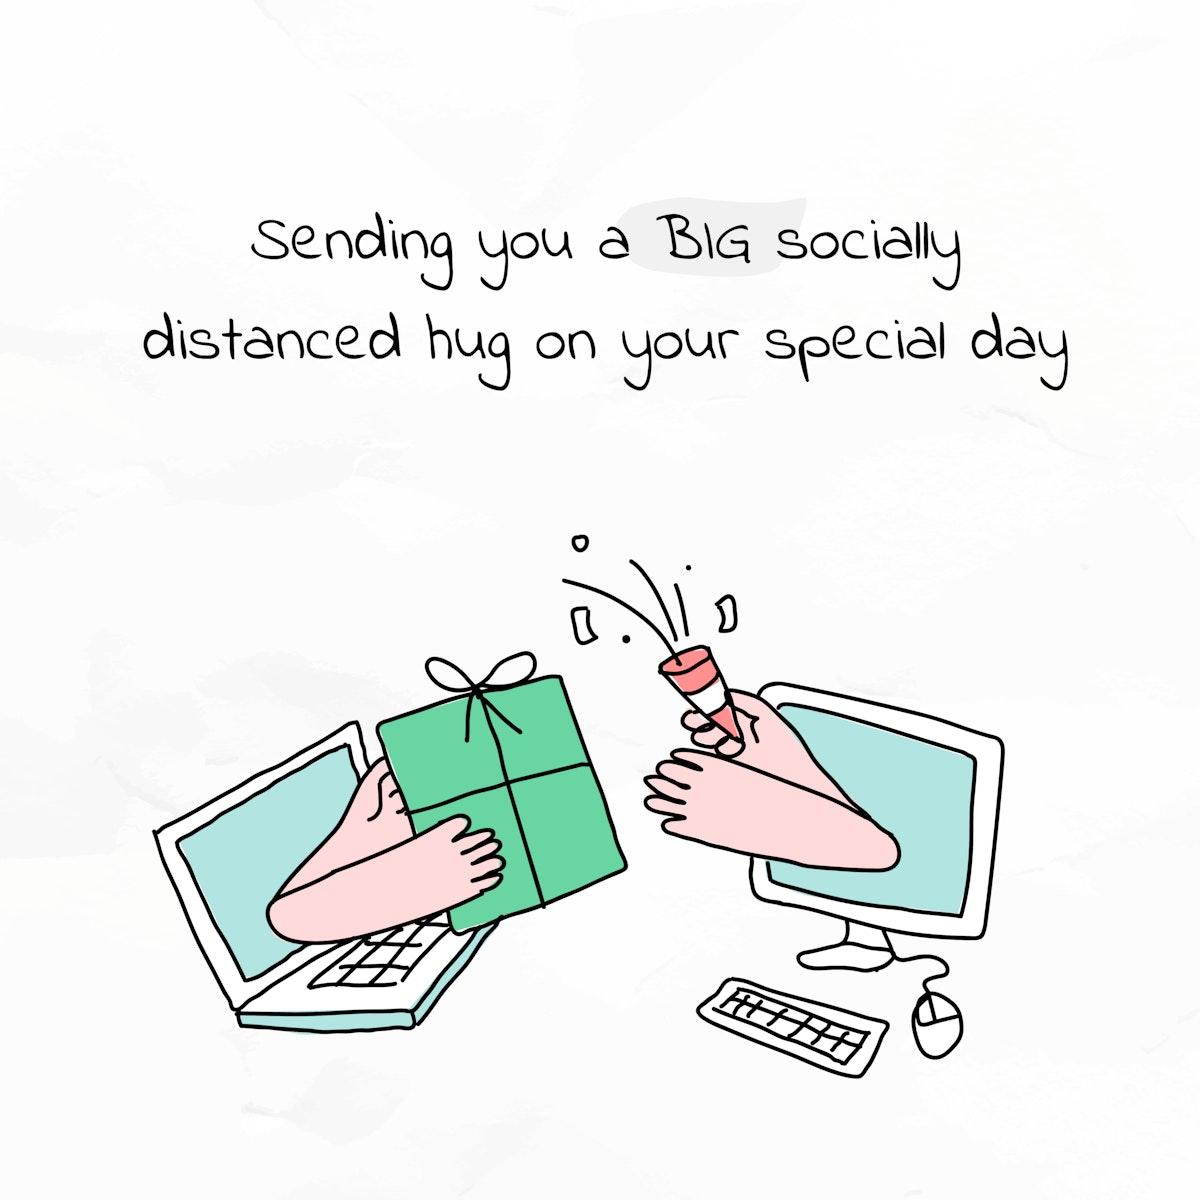 Christmas greeting COVID-19 version cute doodle social media post